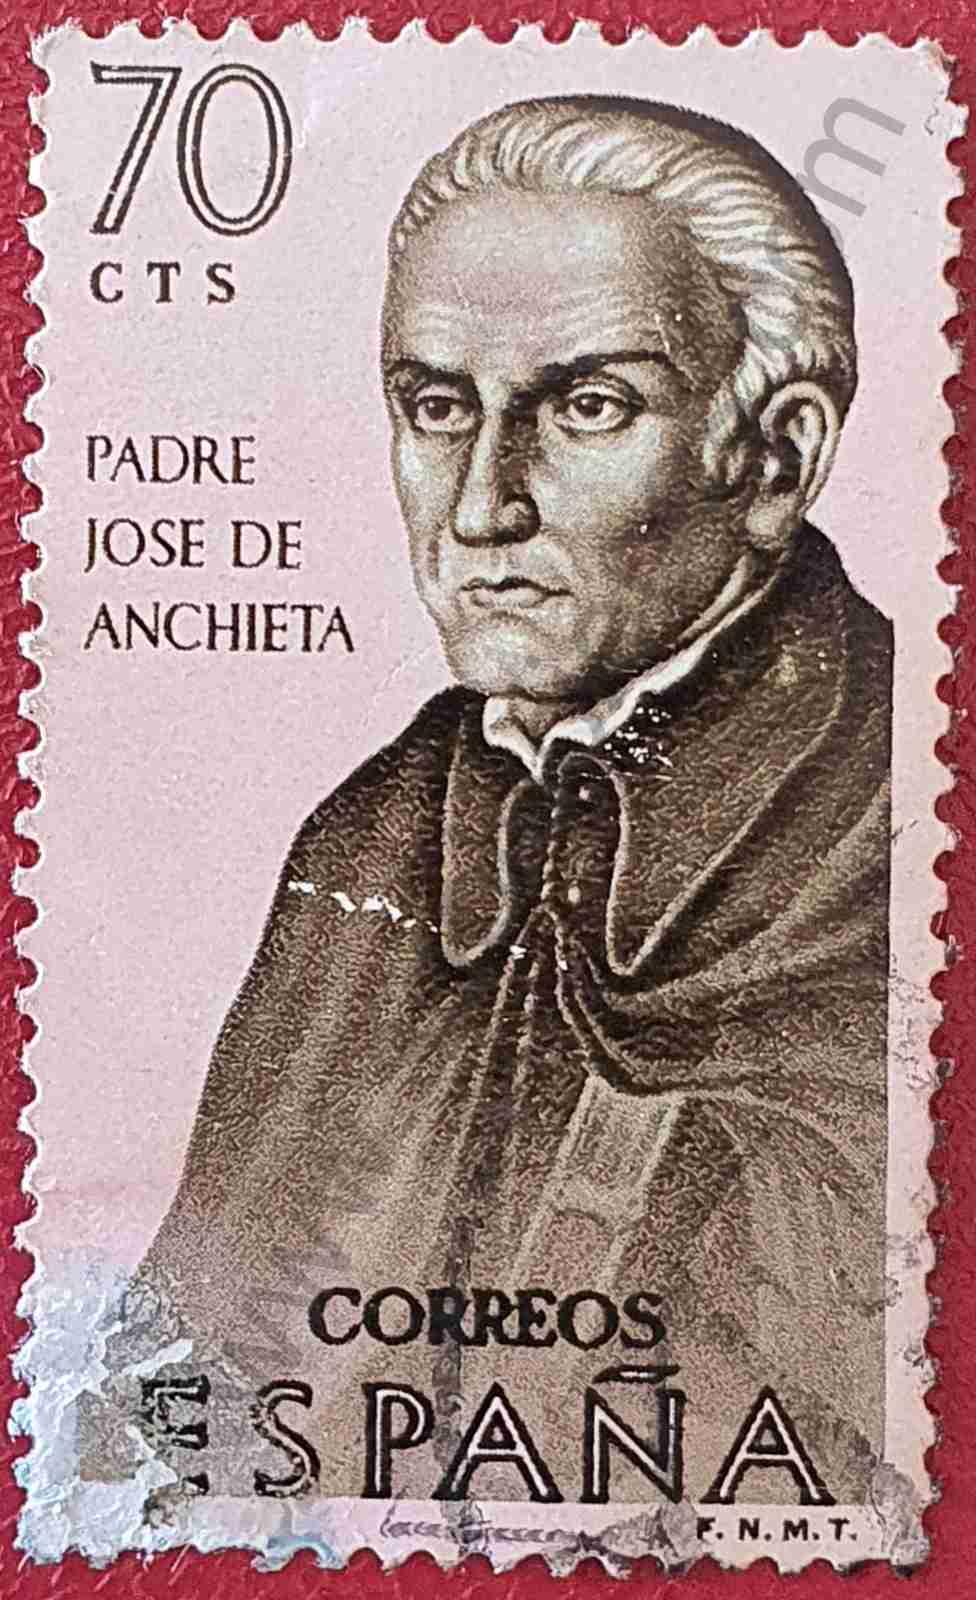 Padre José de Anchieta - Sello España 1965